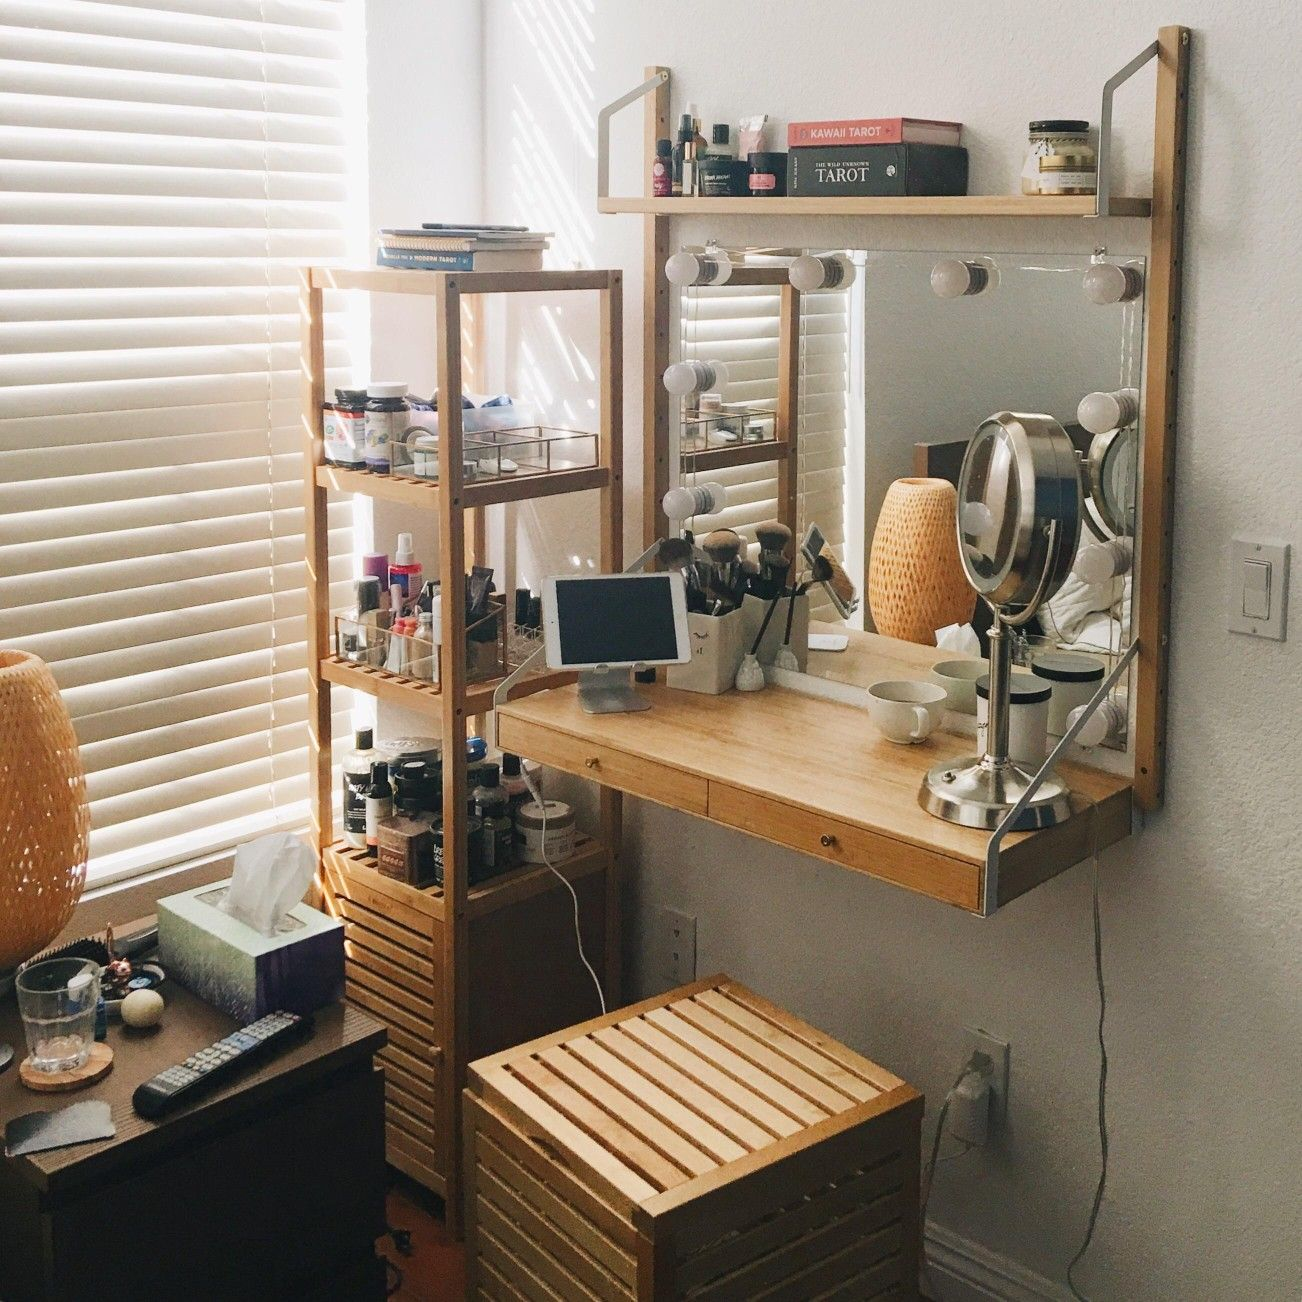 Bamboo Vanity Ikea Svalnas Home Room Design Dressing Table Decor Ikea Svalnas